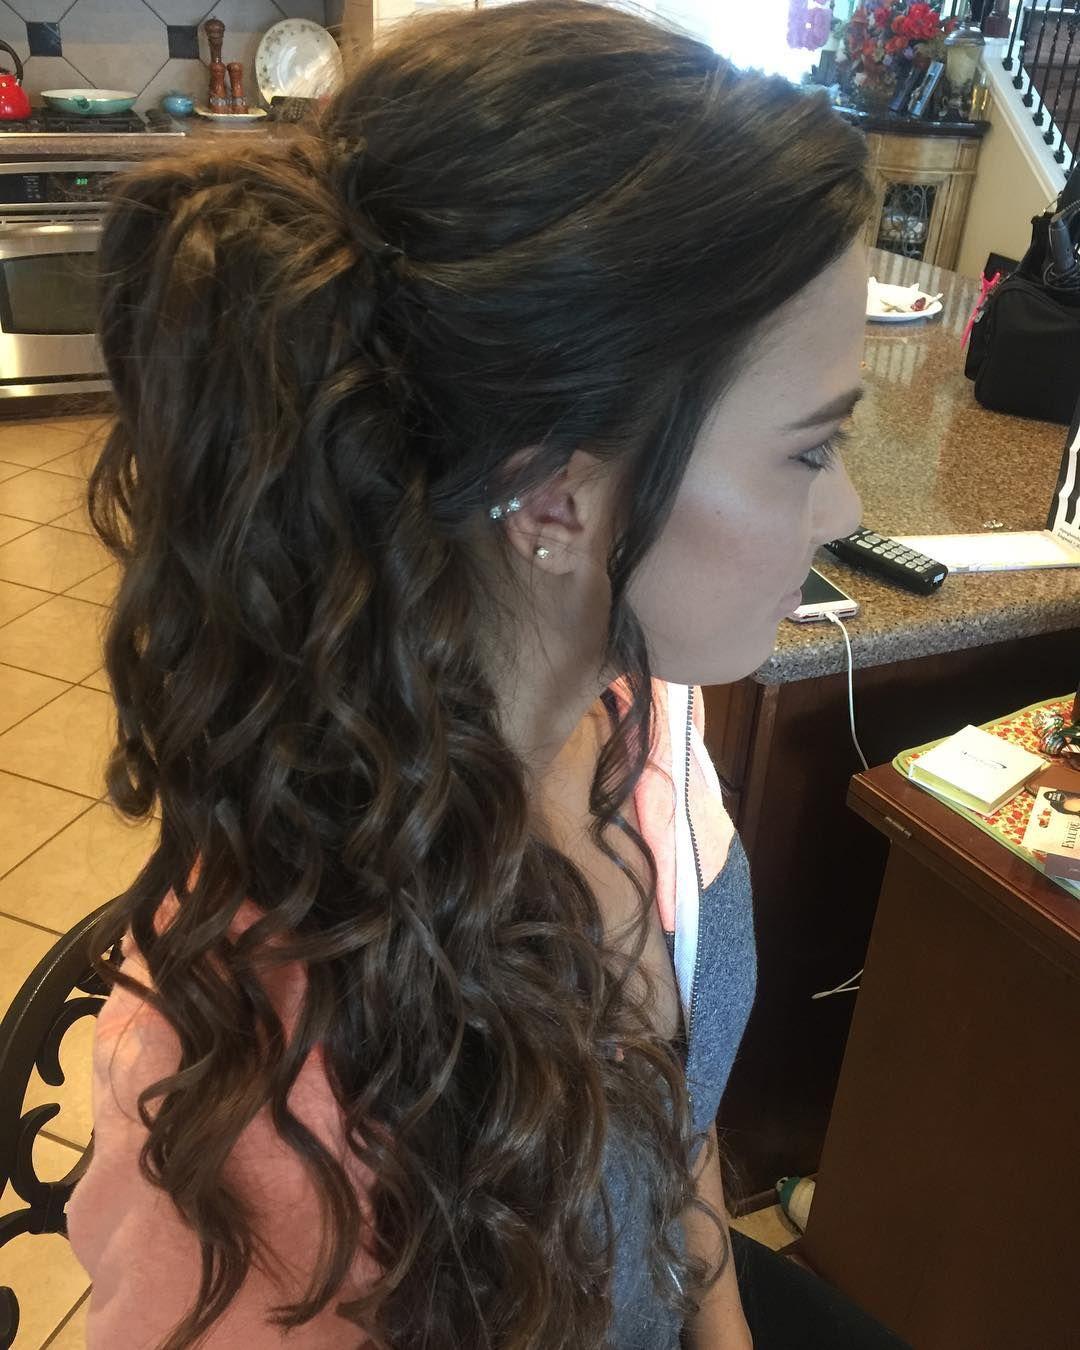 Prom hair i did promhair promhairstyles hairdonebyme houstonhair